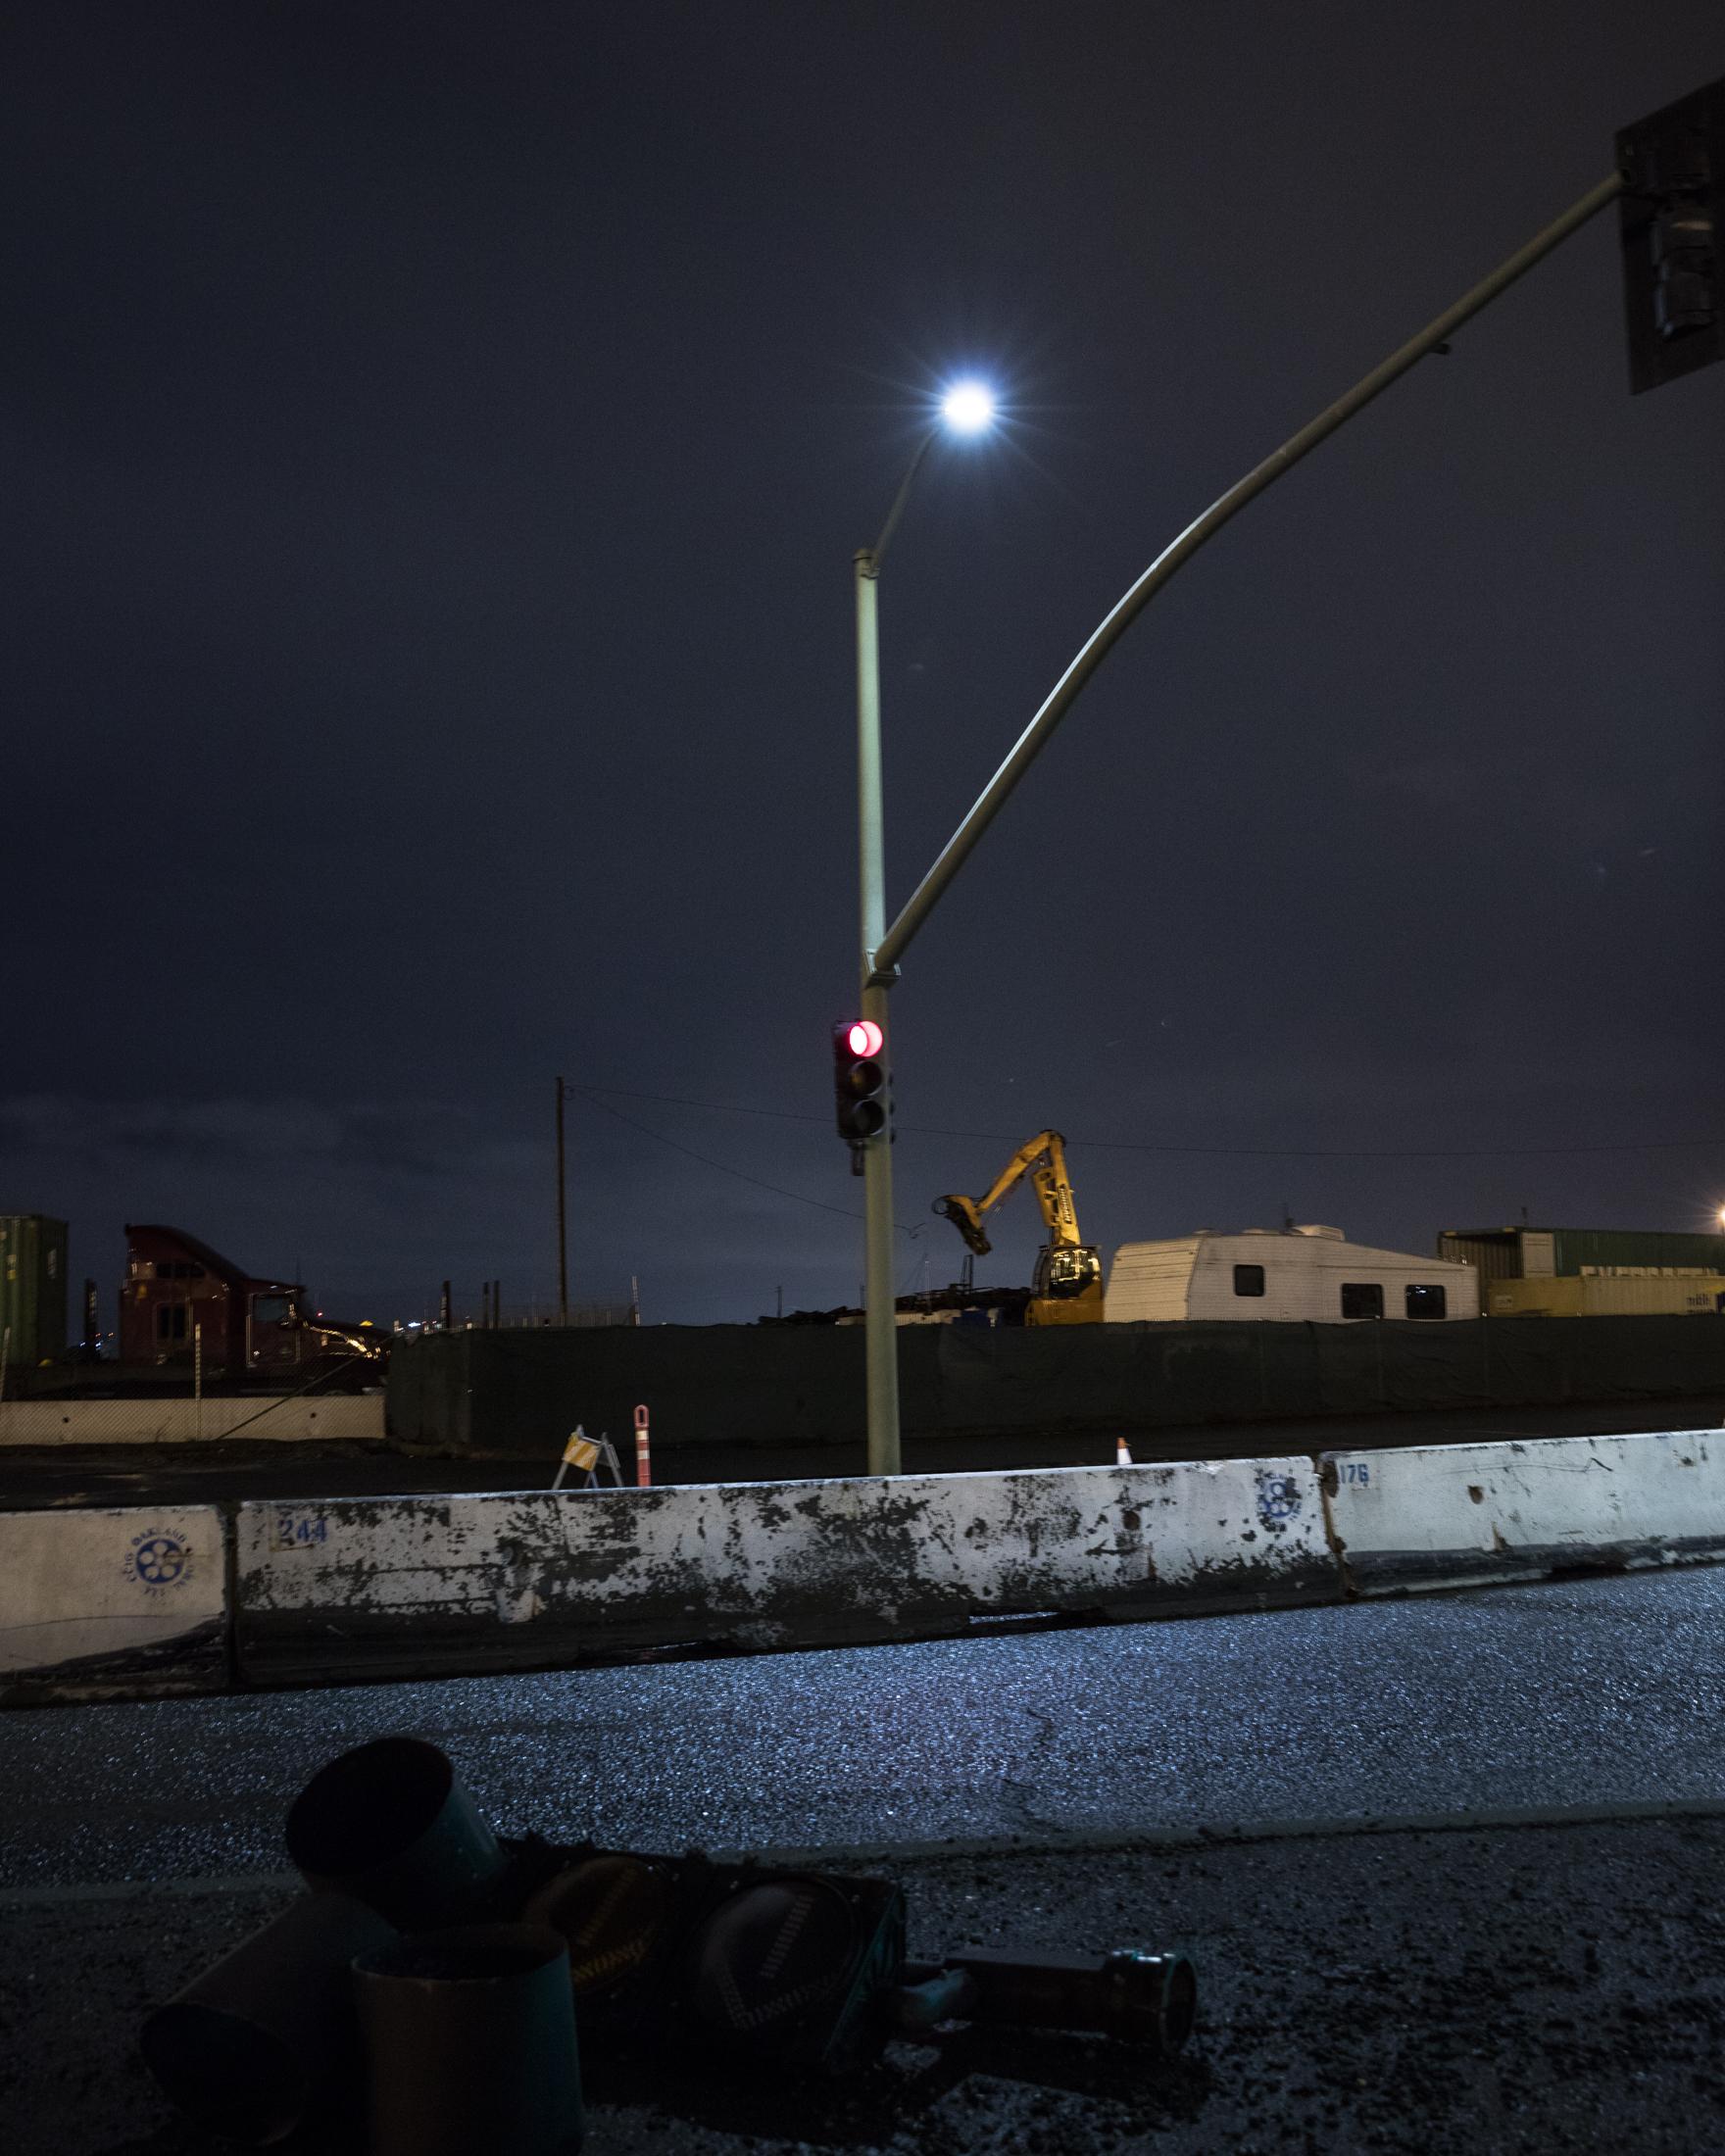 nightdrive-4.jpg